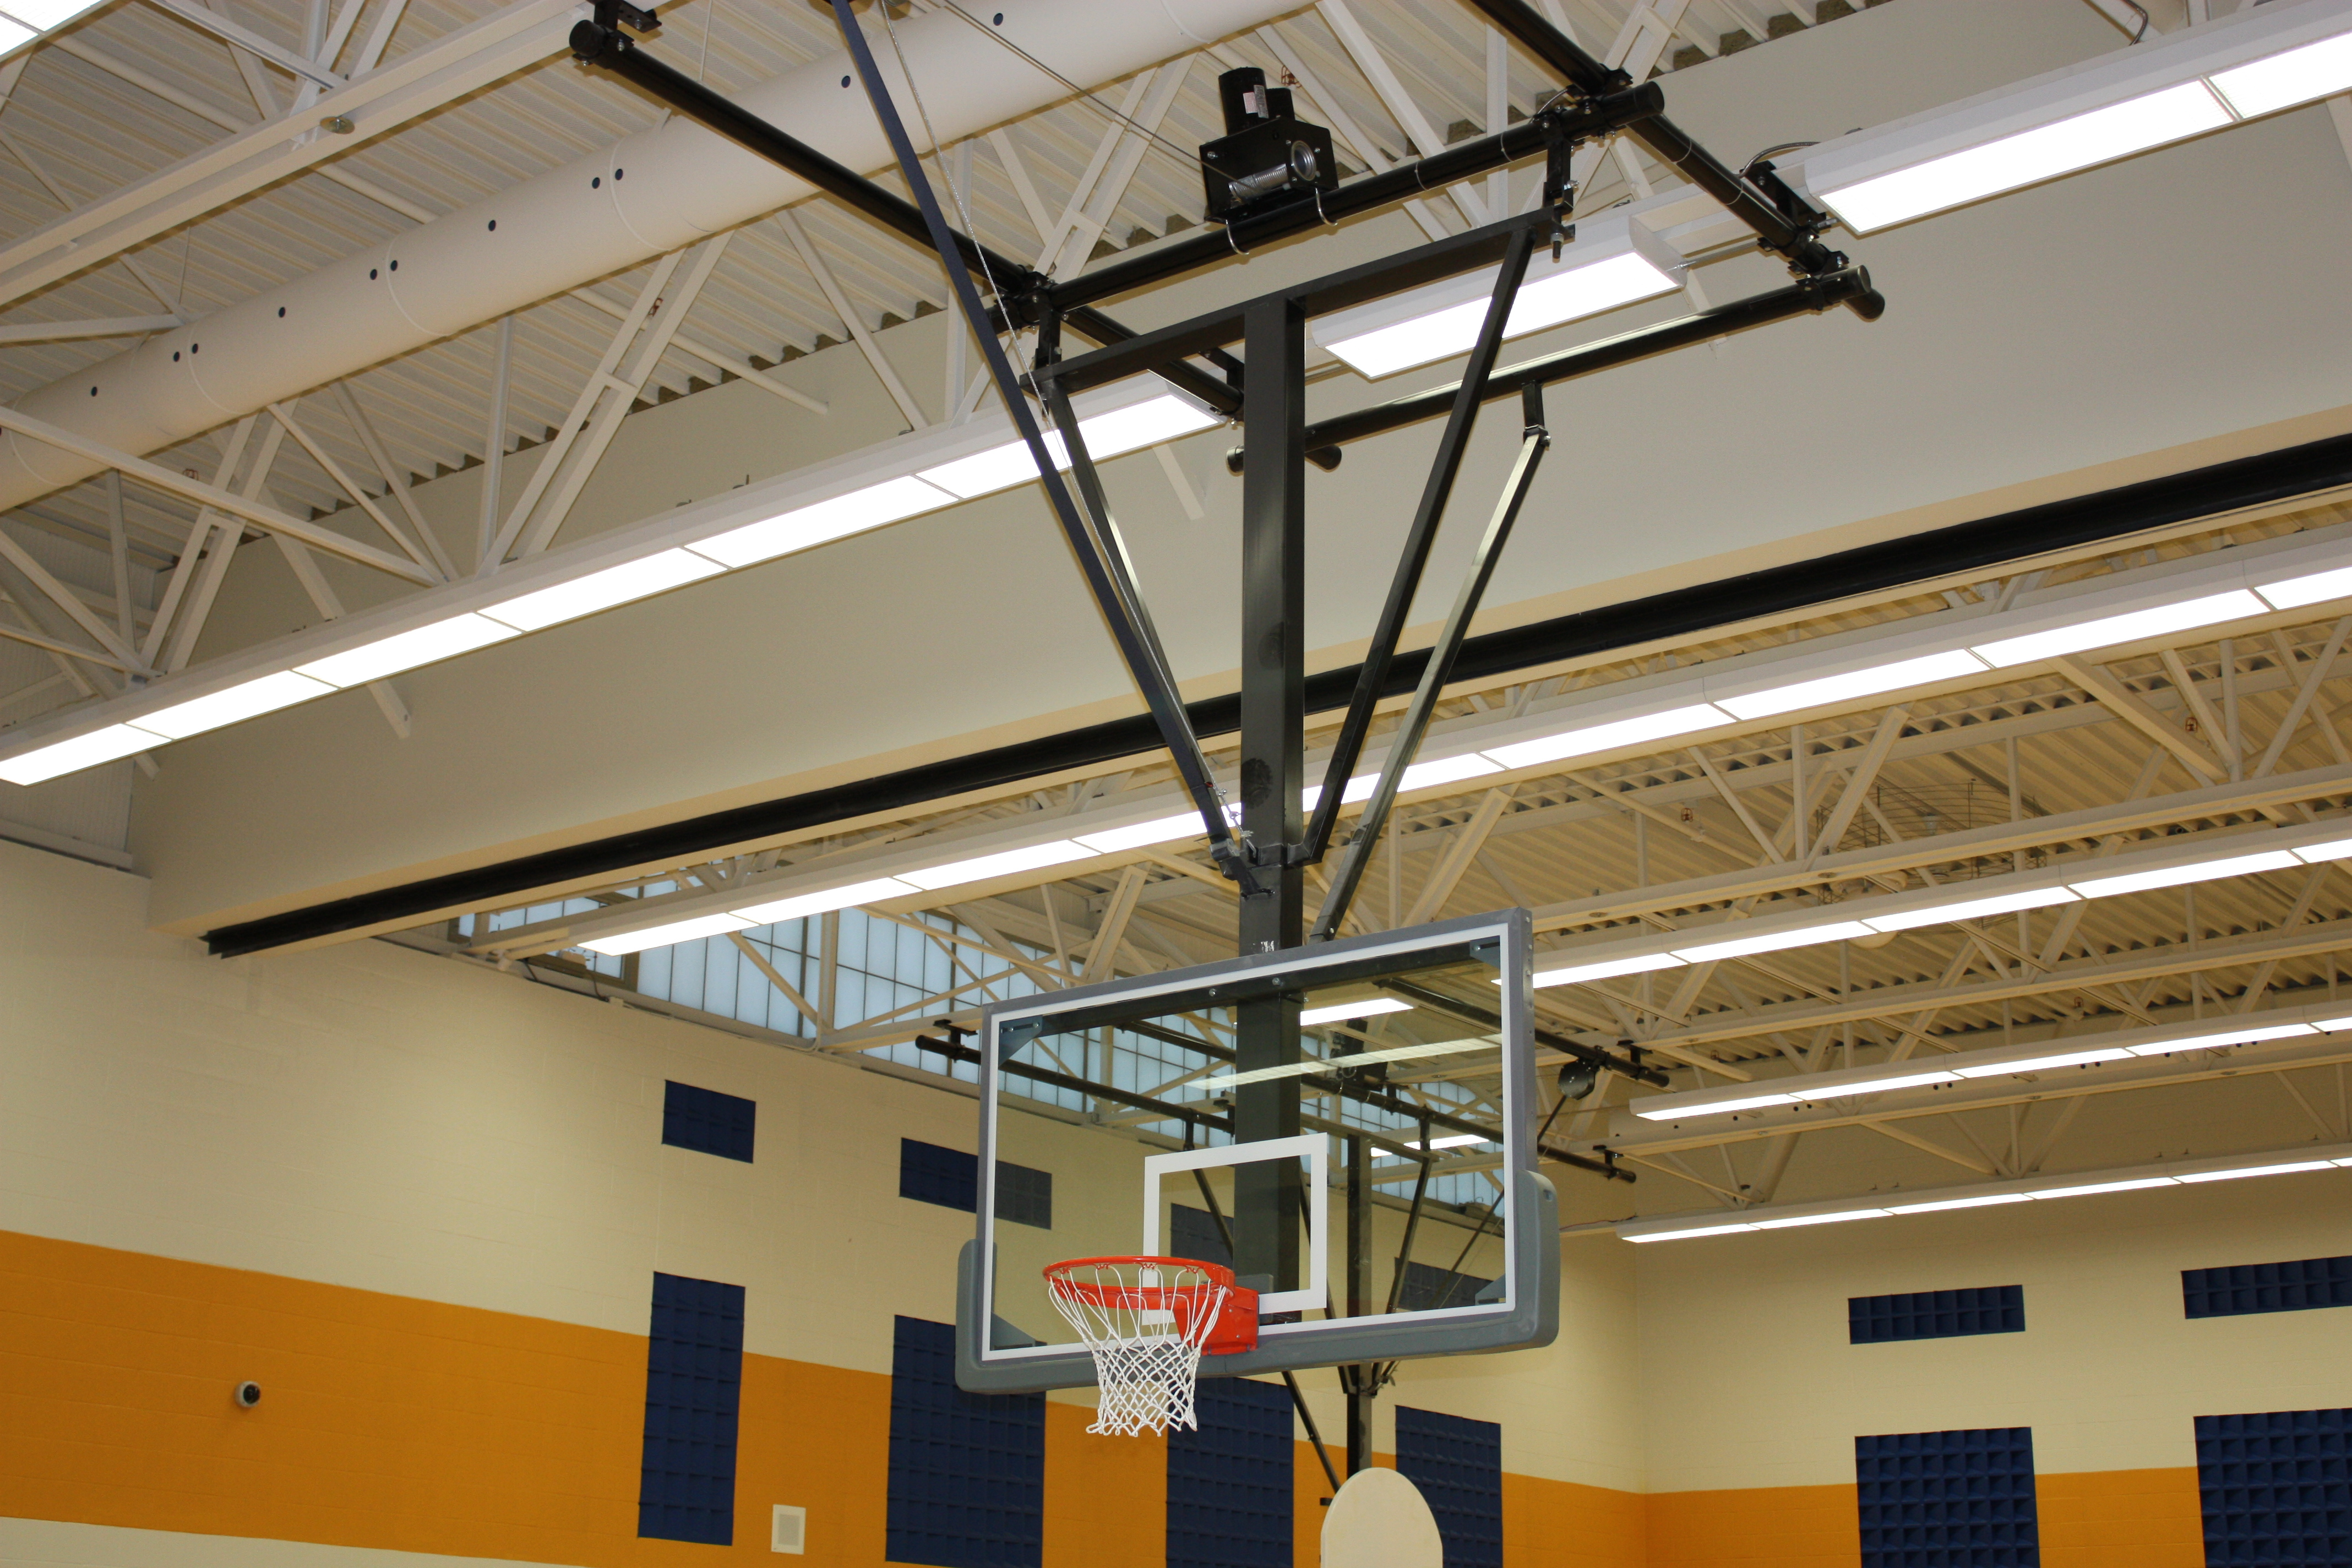 Forward Folding Ceiling Mounted Basketball Backstop